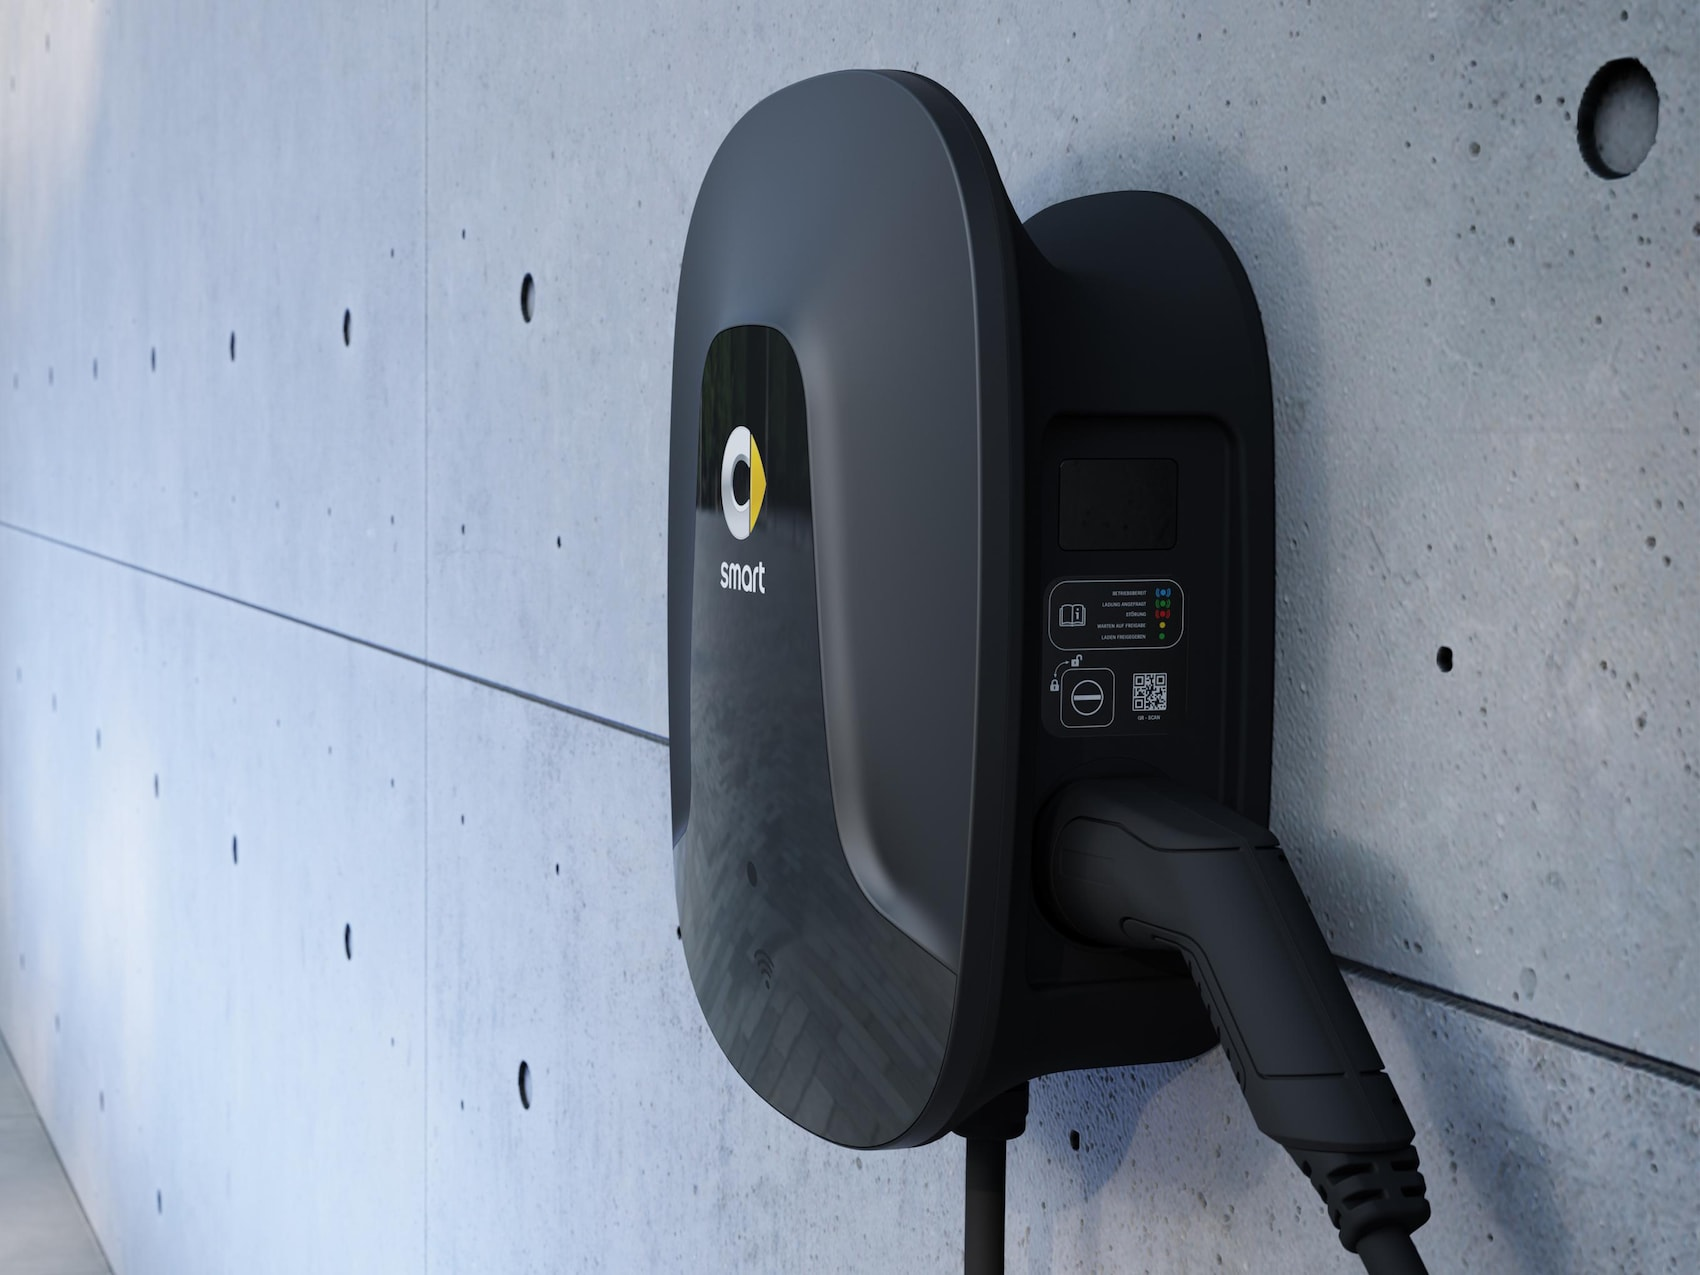 Wallbox smart na parede